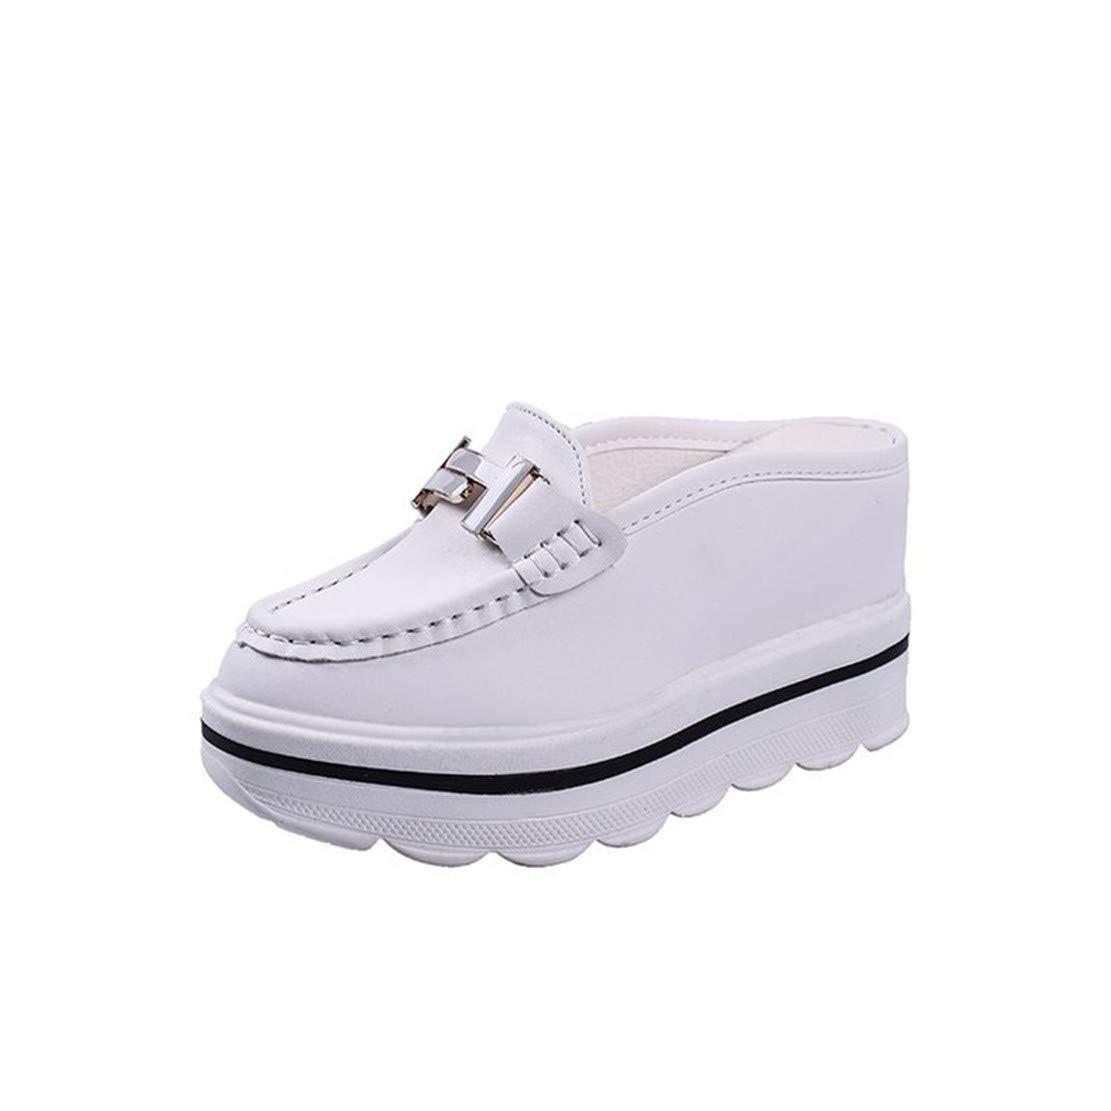 YUCH 19992 Pantoufles B00ZP324CO pour Femmes White White 2a60fa8 - automaticcouplings.space